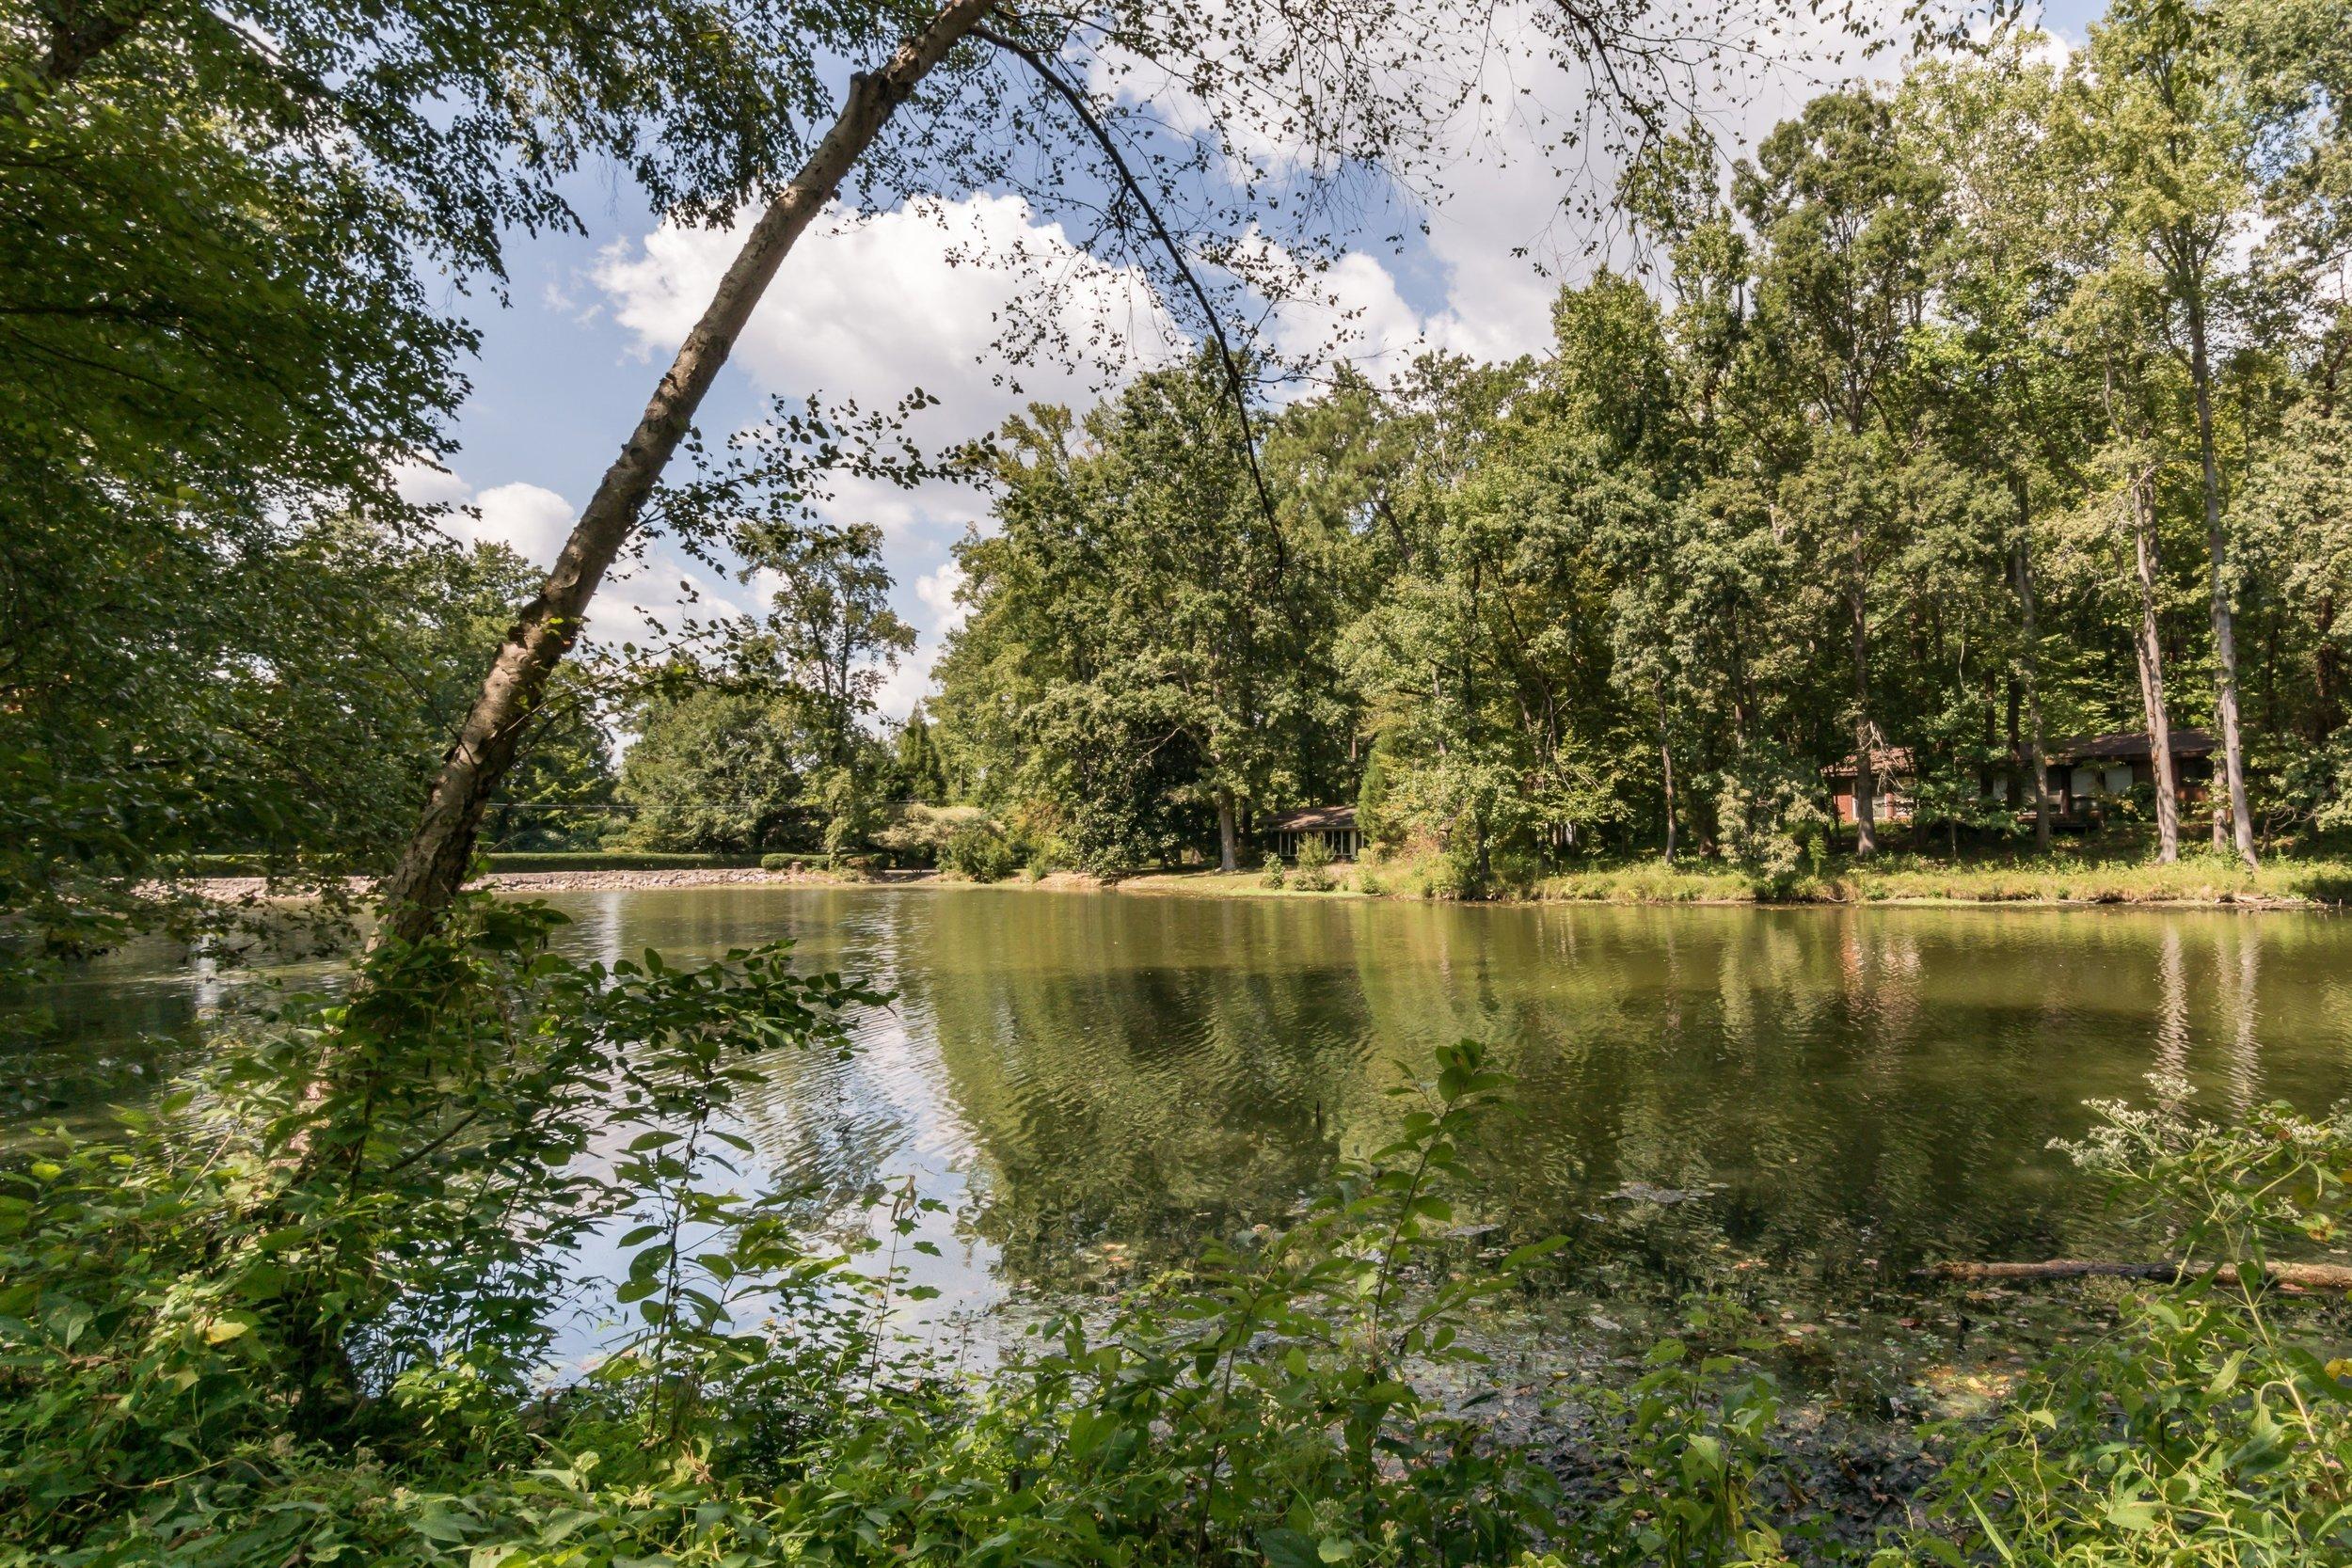 021_On The Pond.jpg